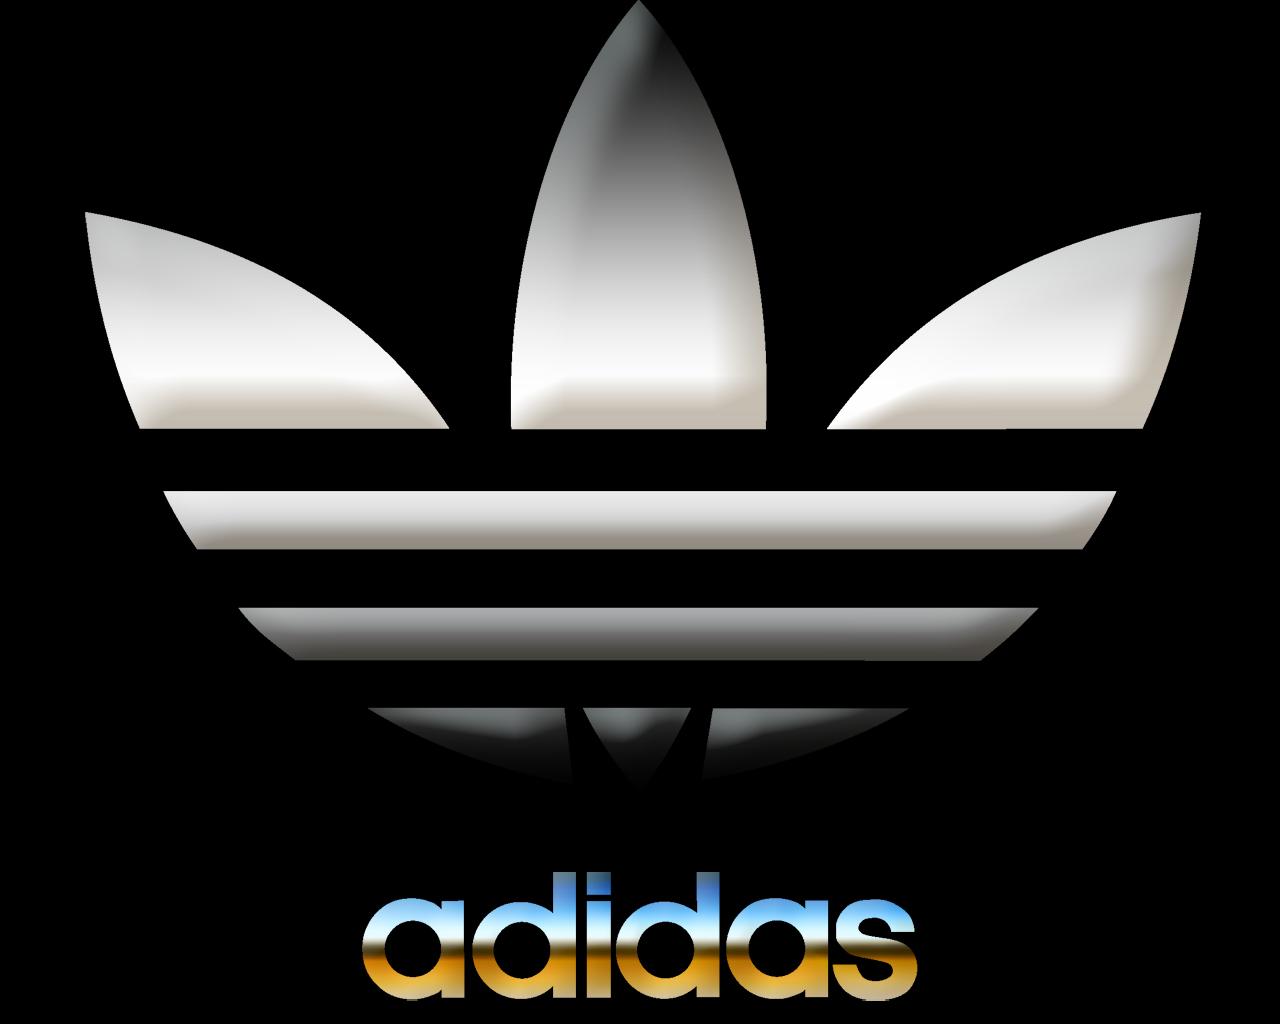 Adidas Logo Wallpaper 6297 Hd Wallpapers in Logos   Imagescicom 1280x1024